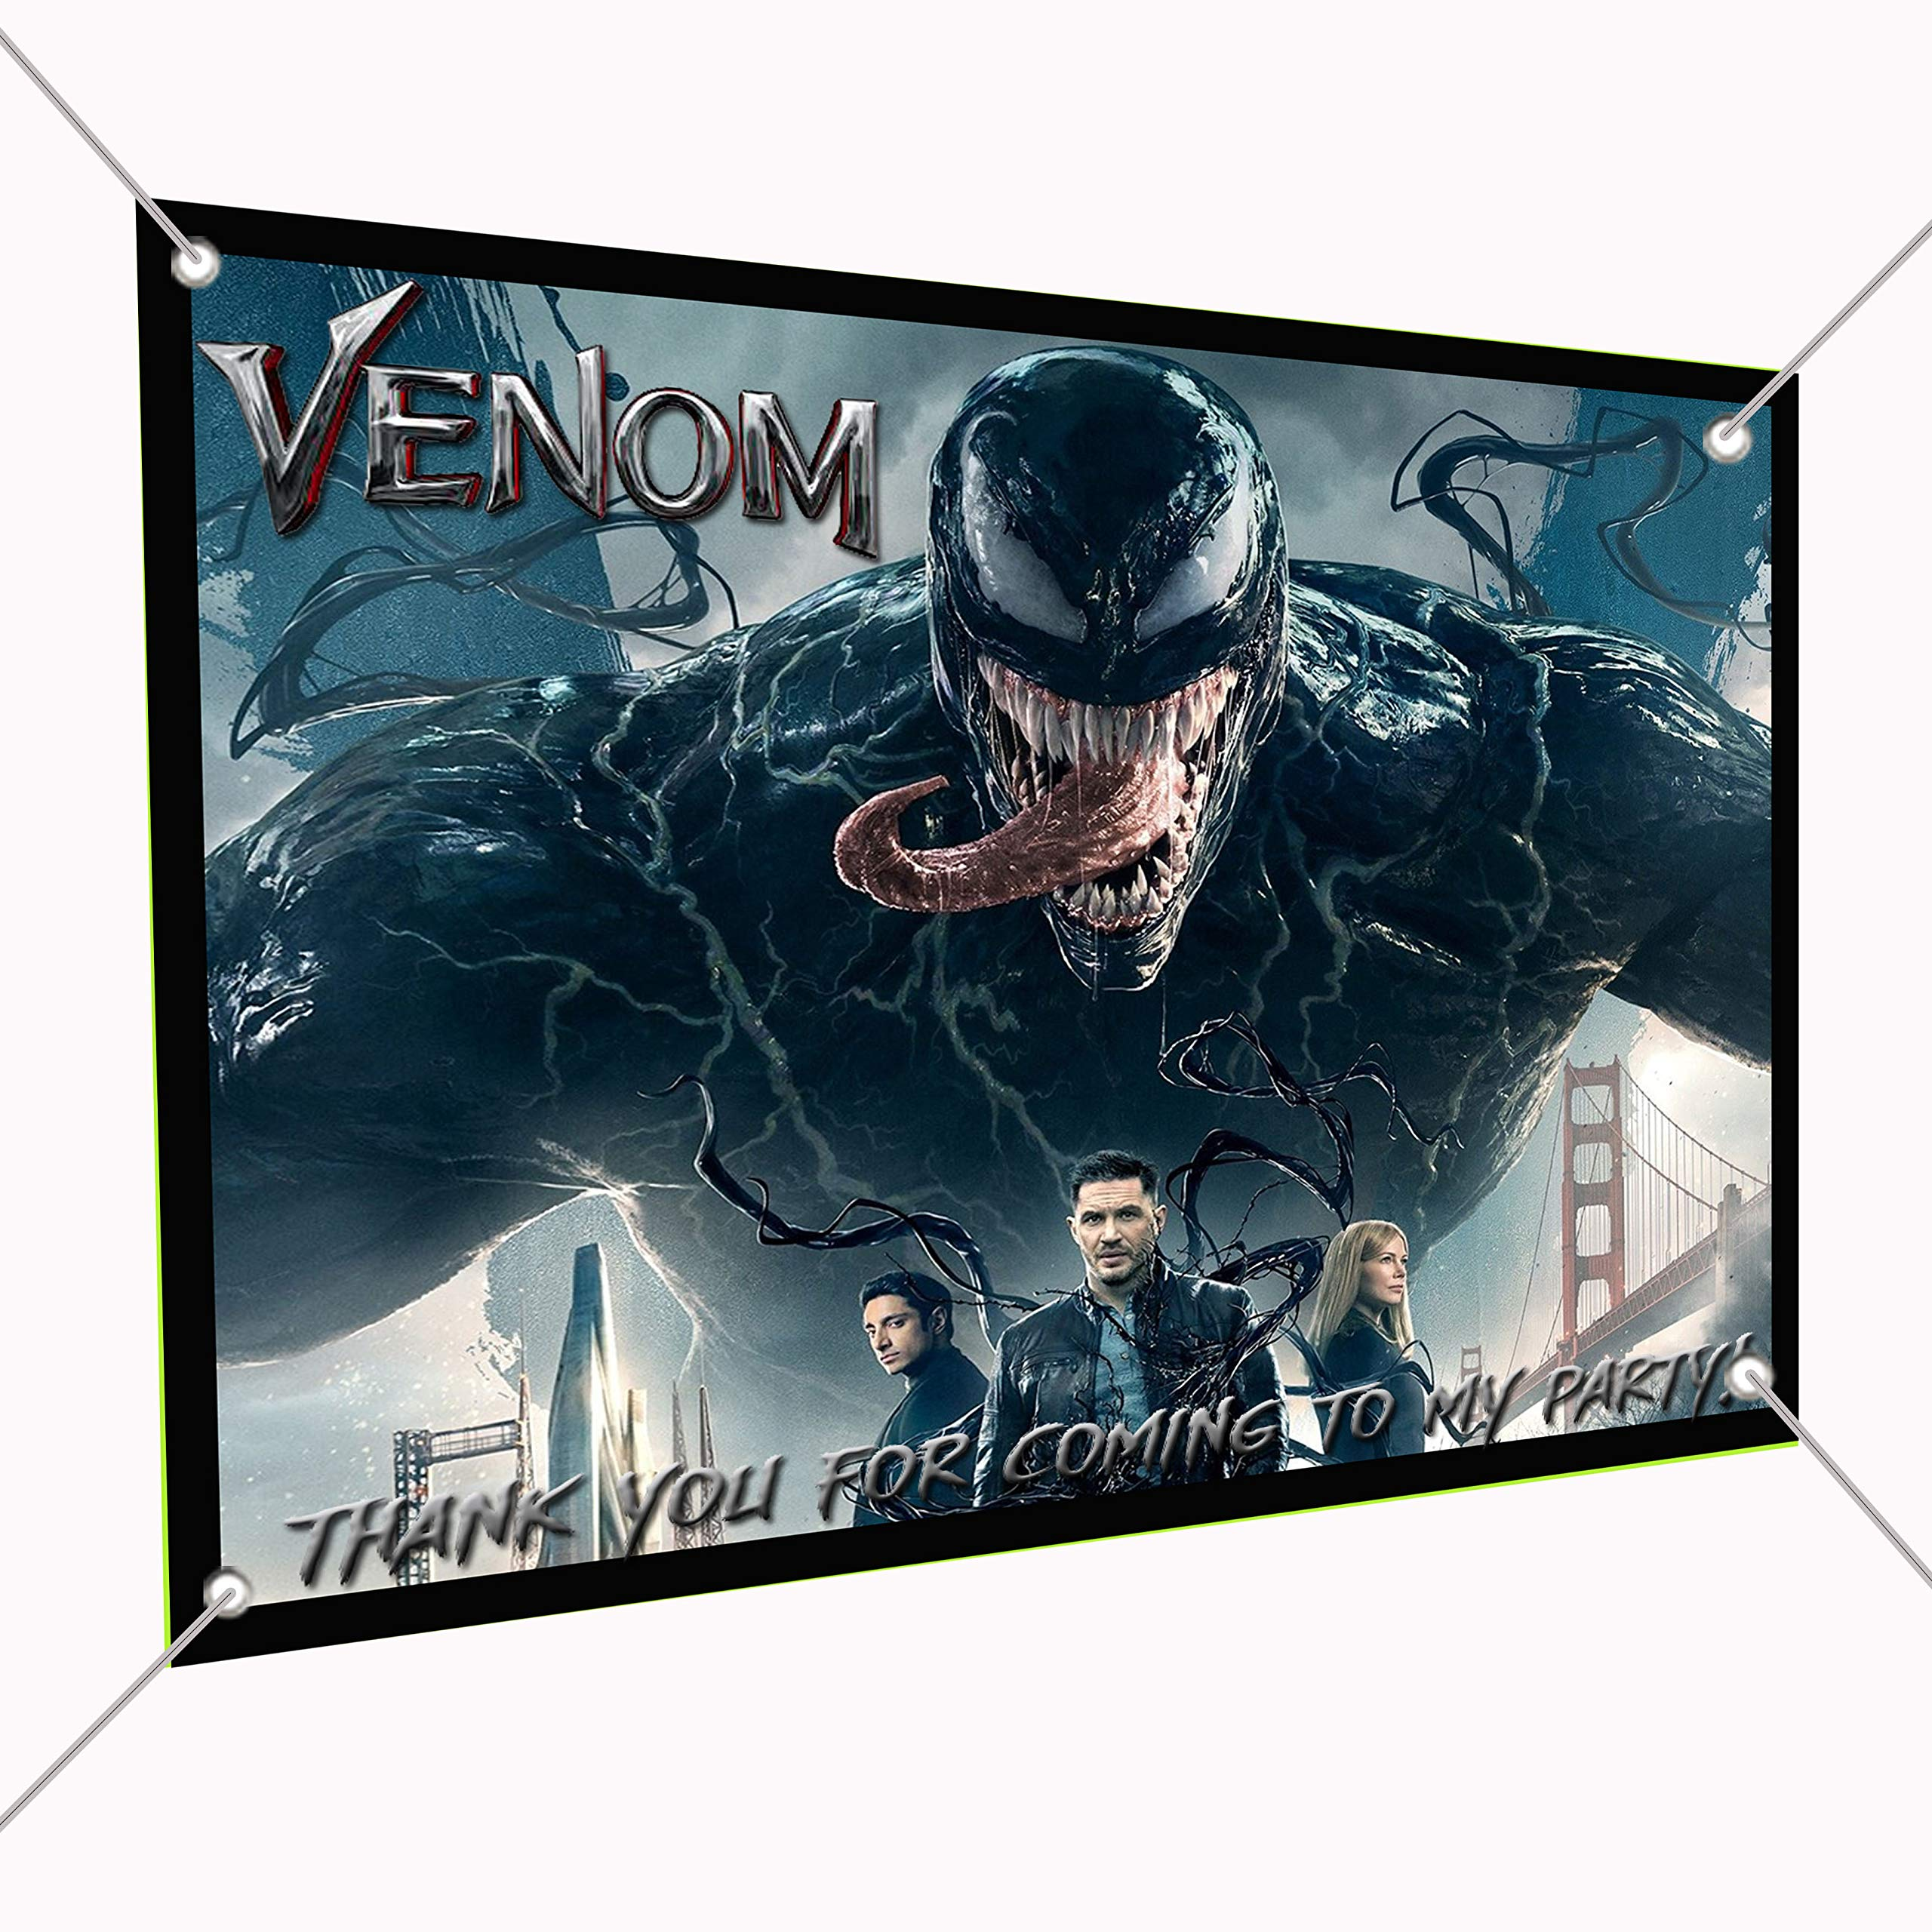 Venom Movie Banner Large Vinyl Indoor or Outdoor Banner - Sign Poster Backdrop, Party Favor Decoration, 30'' x 24'', 2.5' x 2' Marvel Comics Anti-Hero Eddie Brock